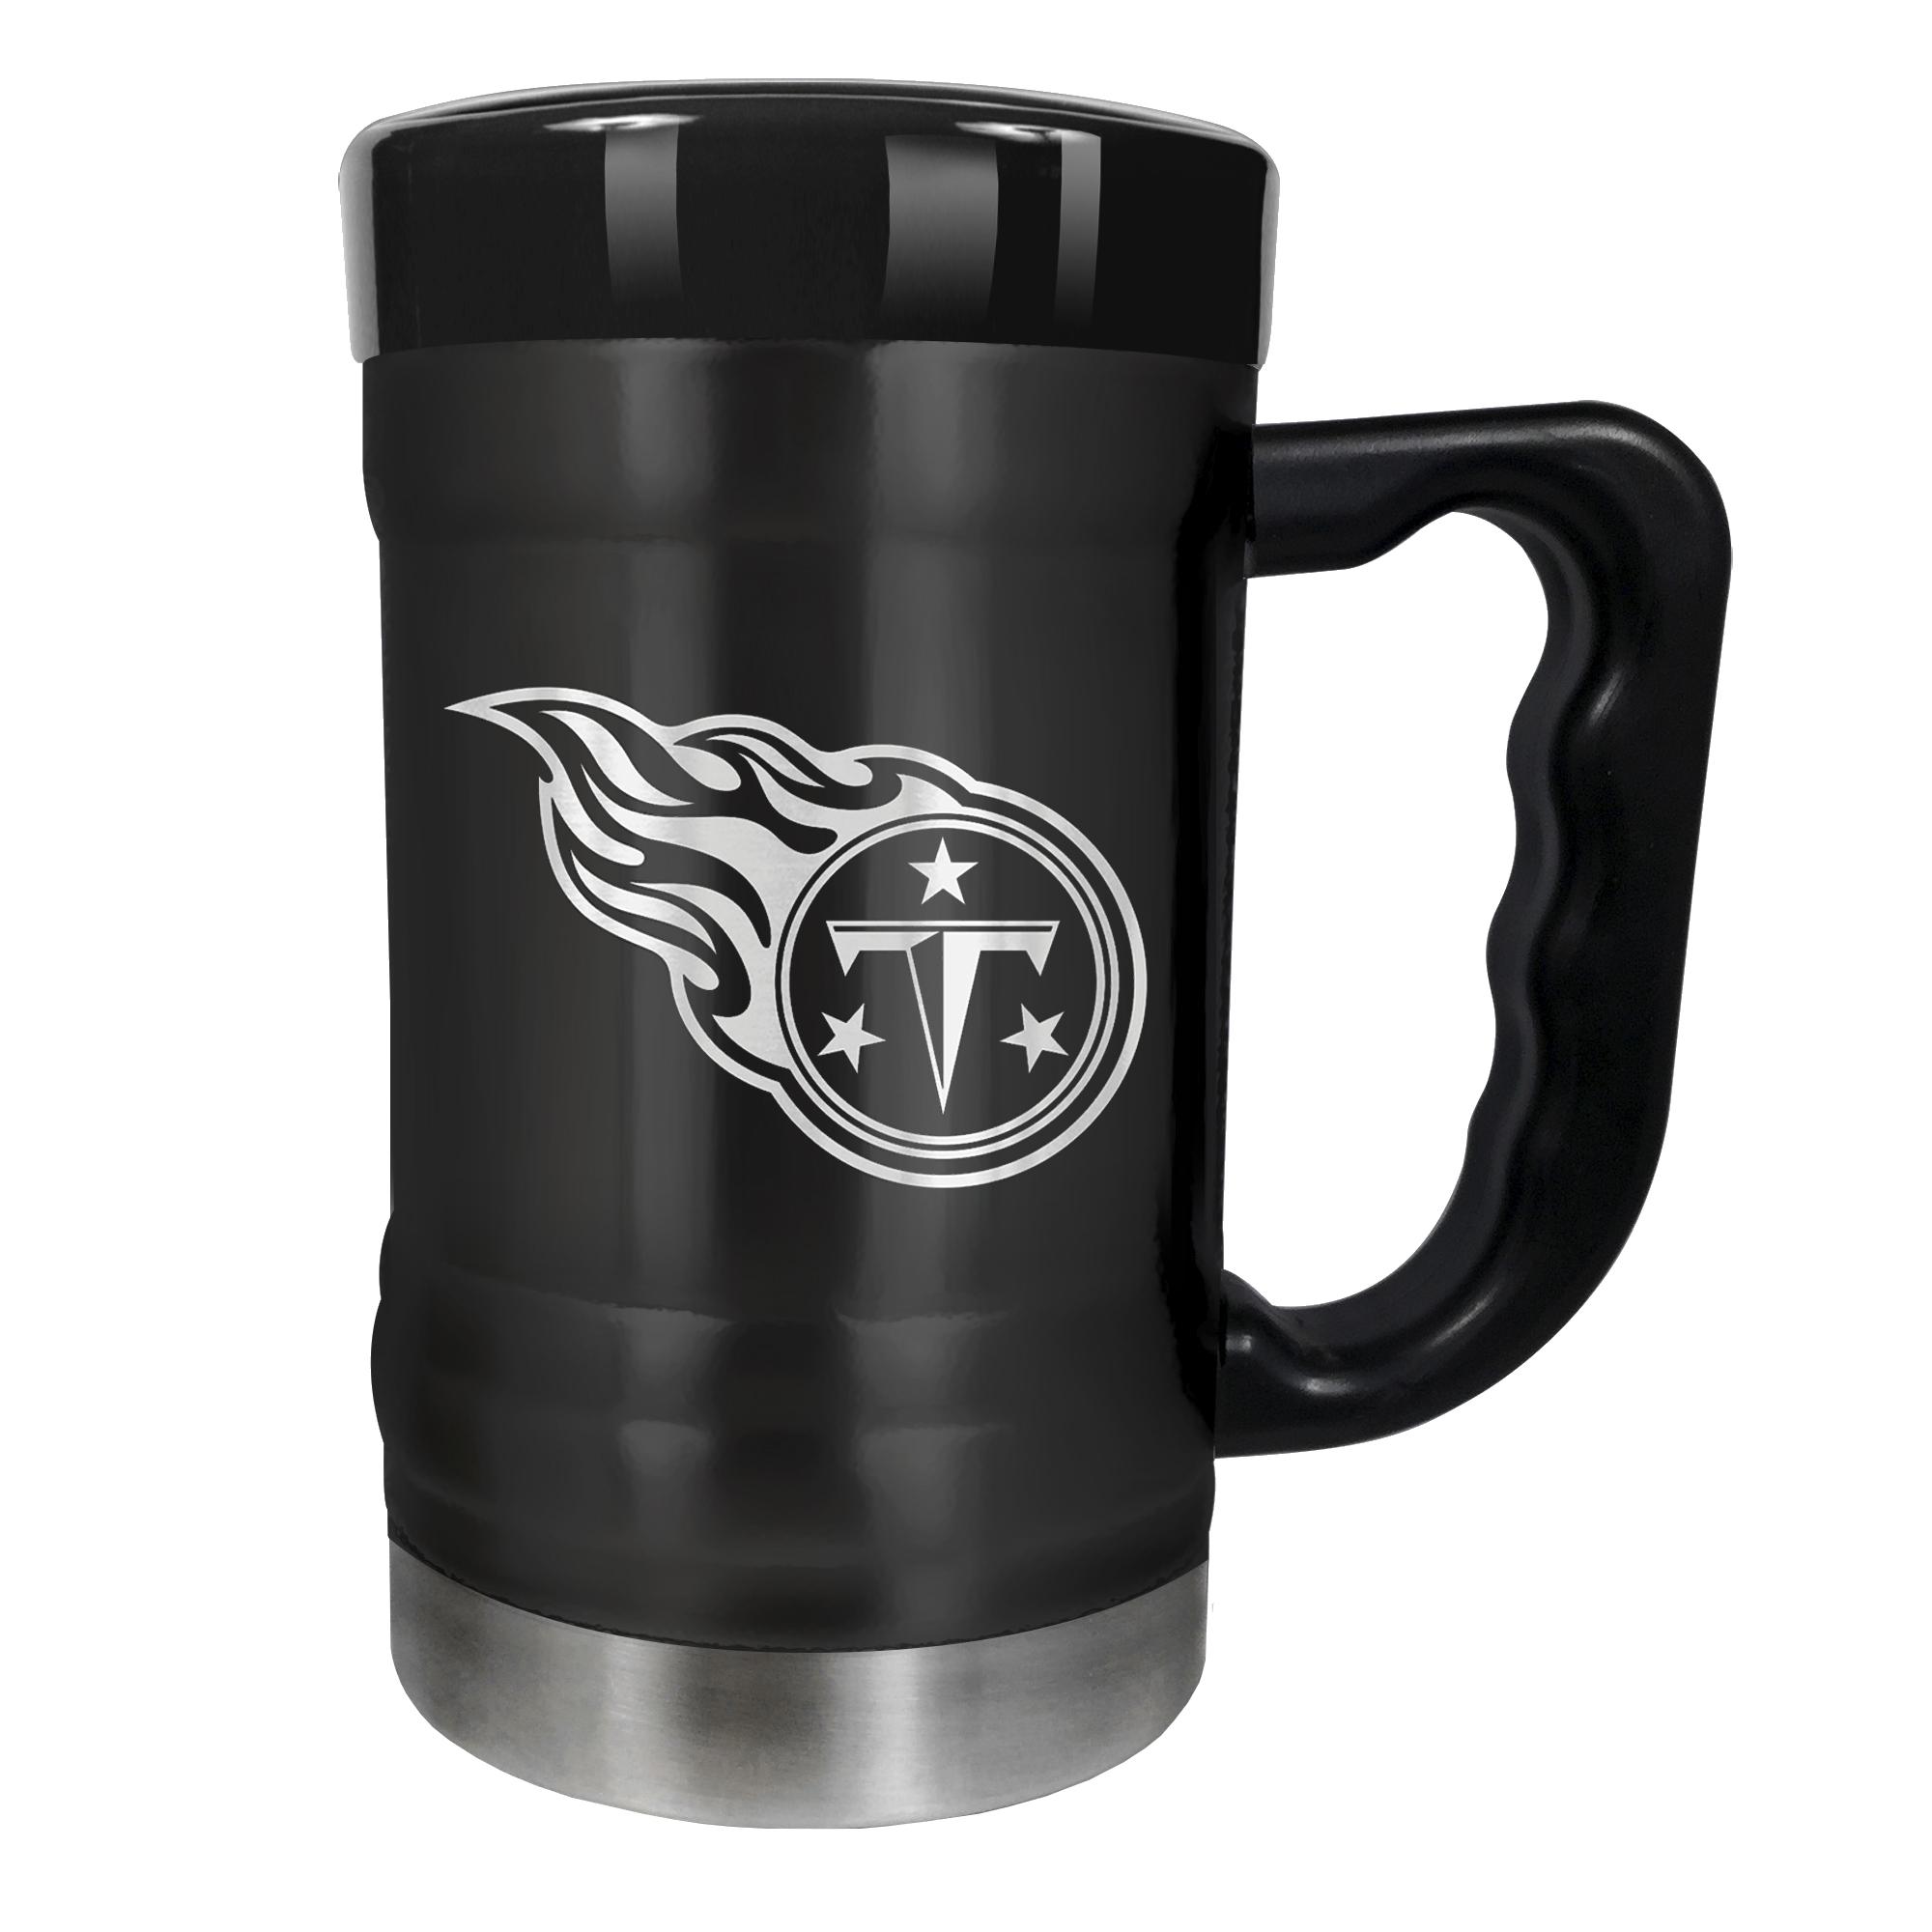 Tennessee Titans 15oz. Stealth Coach Coffee Mug - Black - No Size